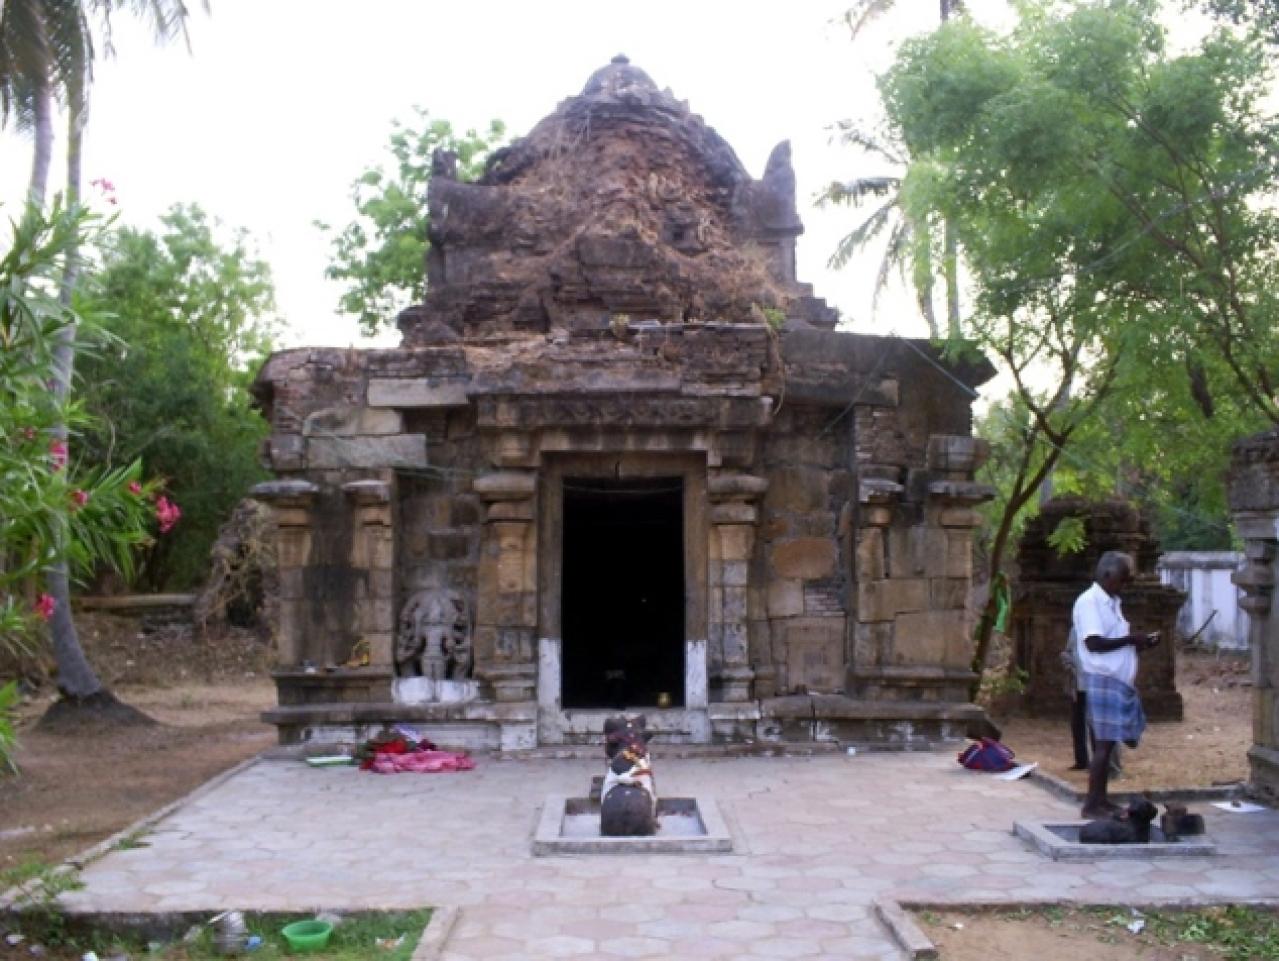 Temple before demolition: Photo courtesy: REACH foundation